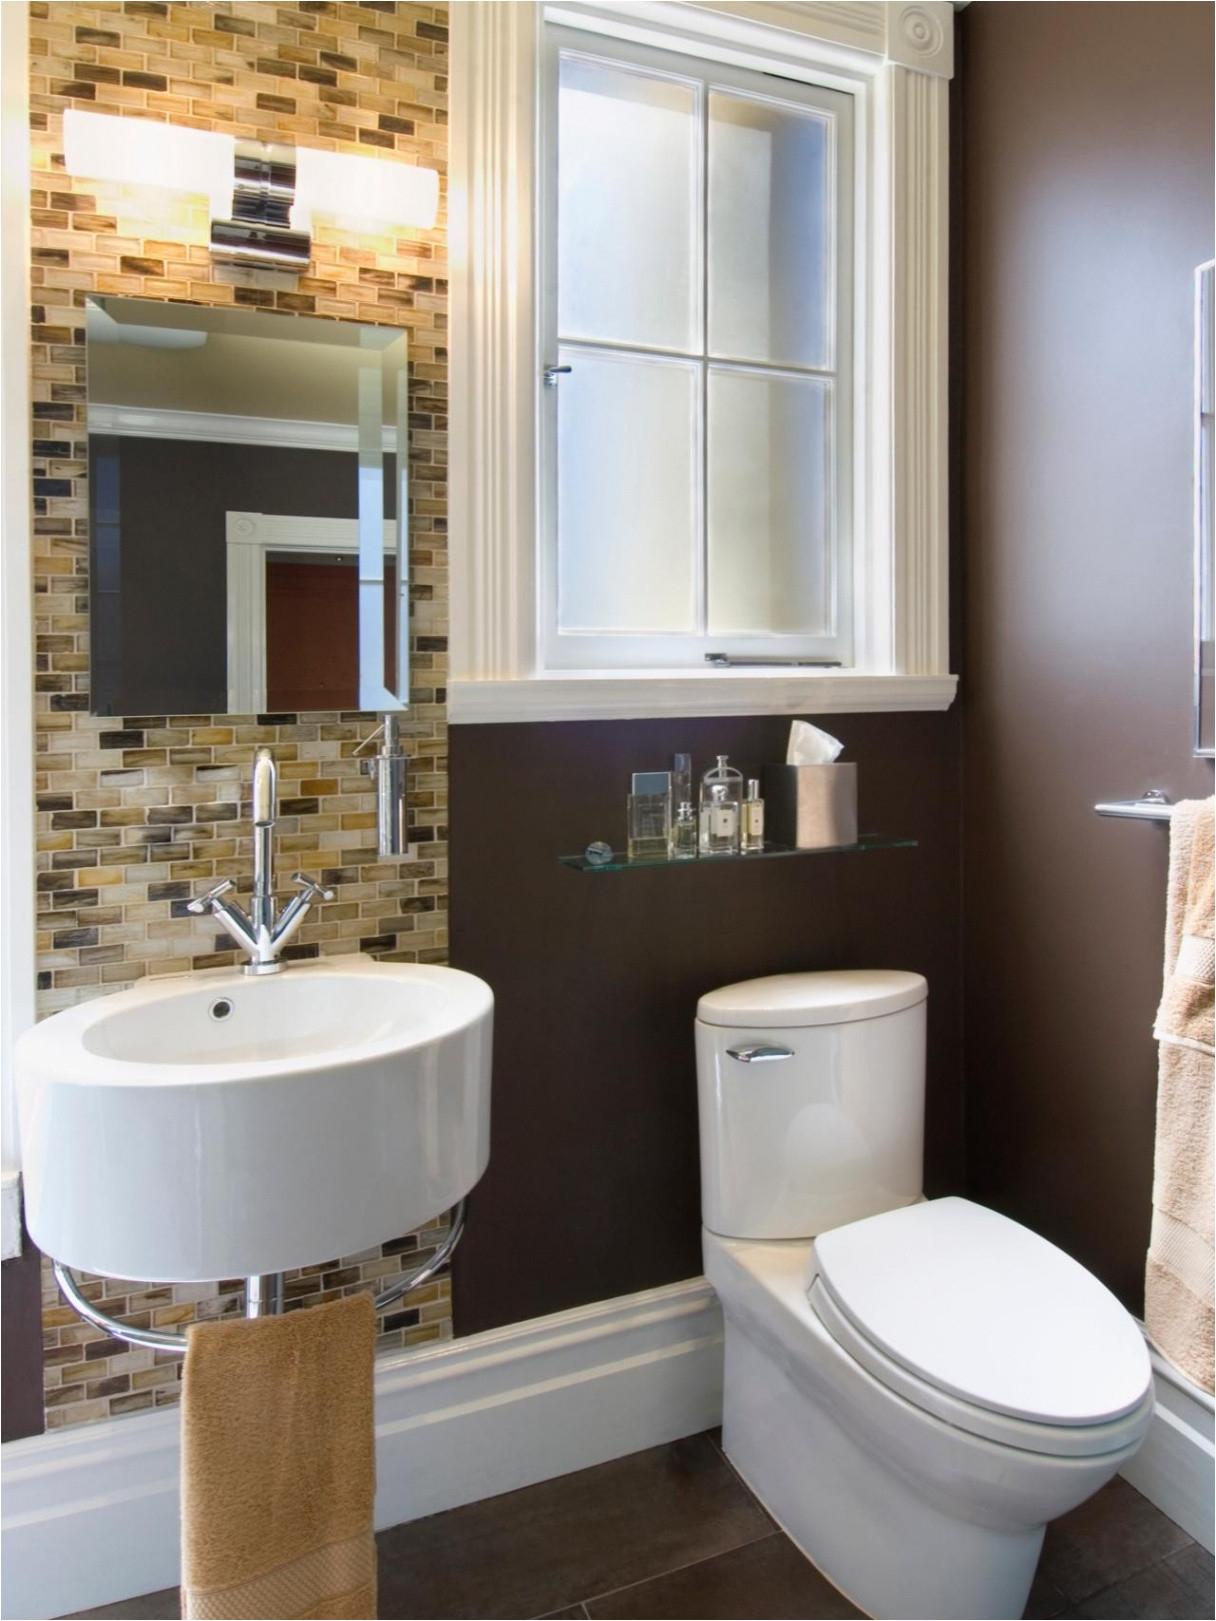 Hgtv Small Bathroom Design Ideas 38 New Hgtv Small Bathrooms